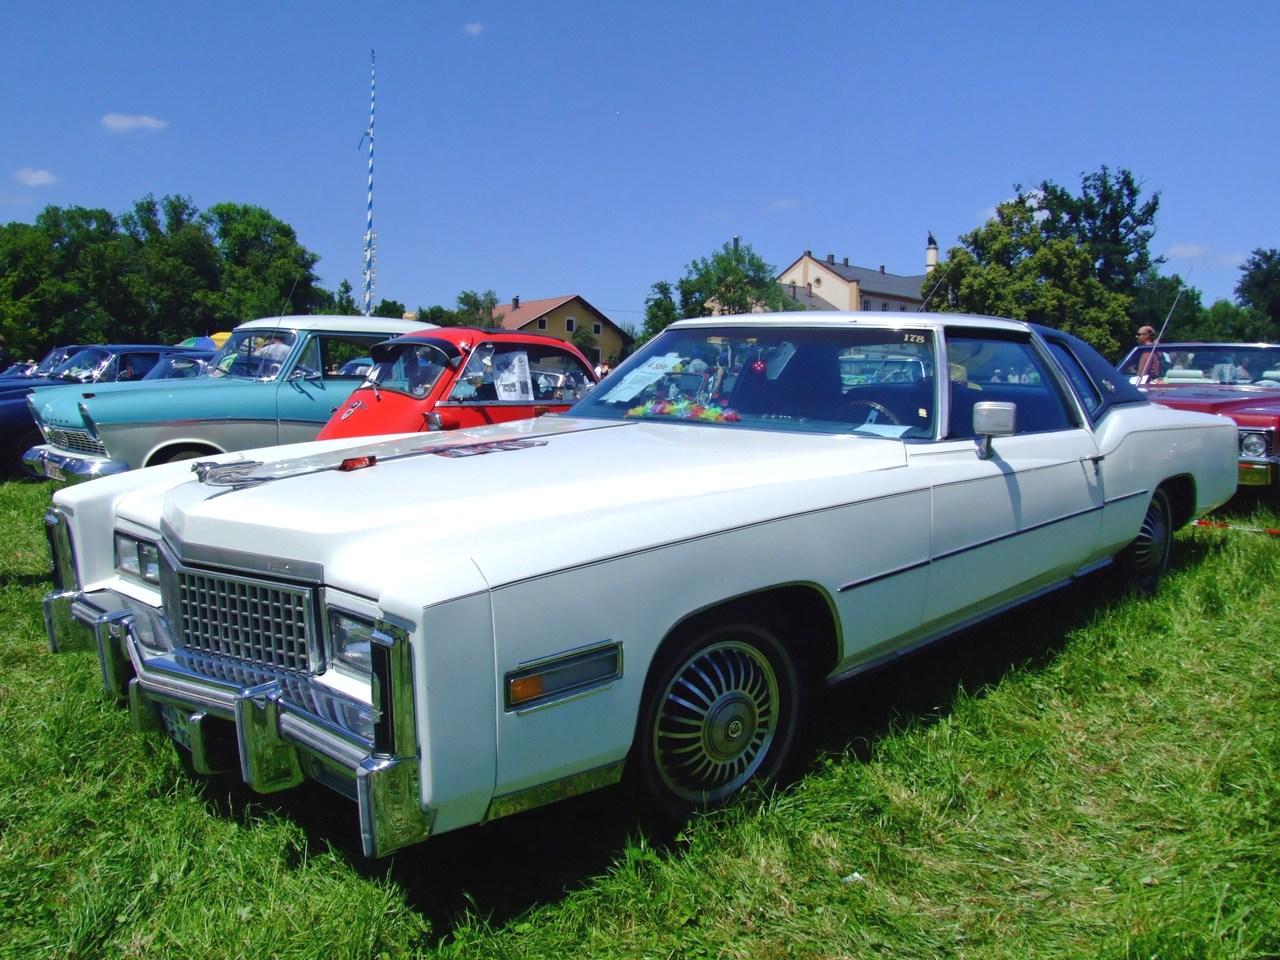 File:Cadillac Eldorado 1975 1.jpg - Wikimedia Commons